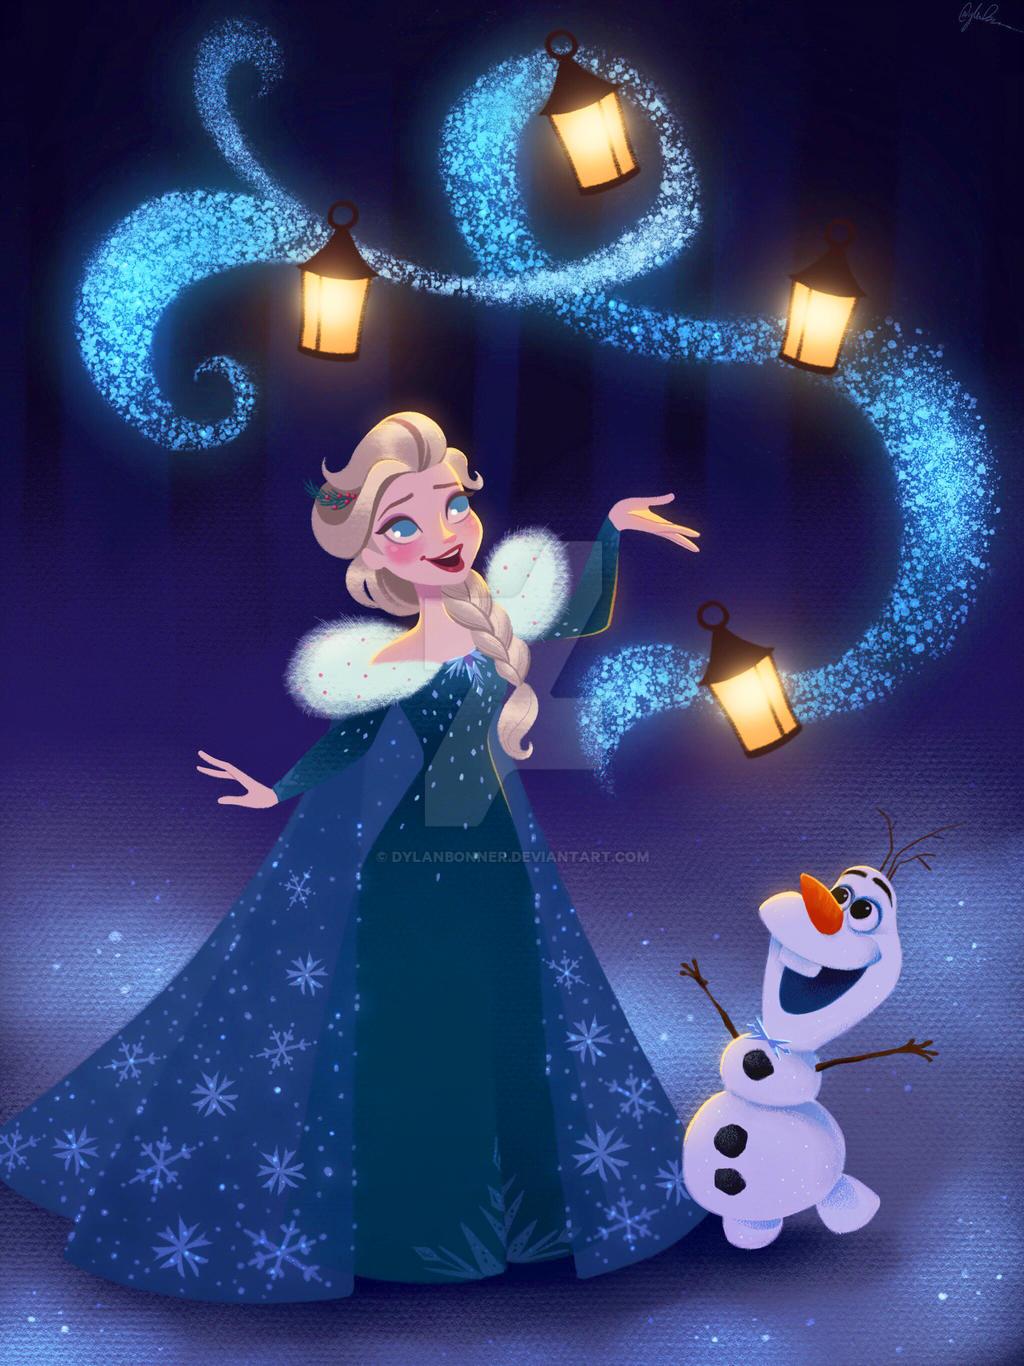 Olafs Frozen Adventure by DylanBonner on DeviantArt